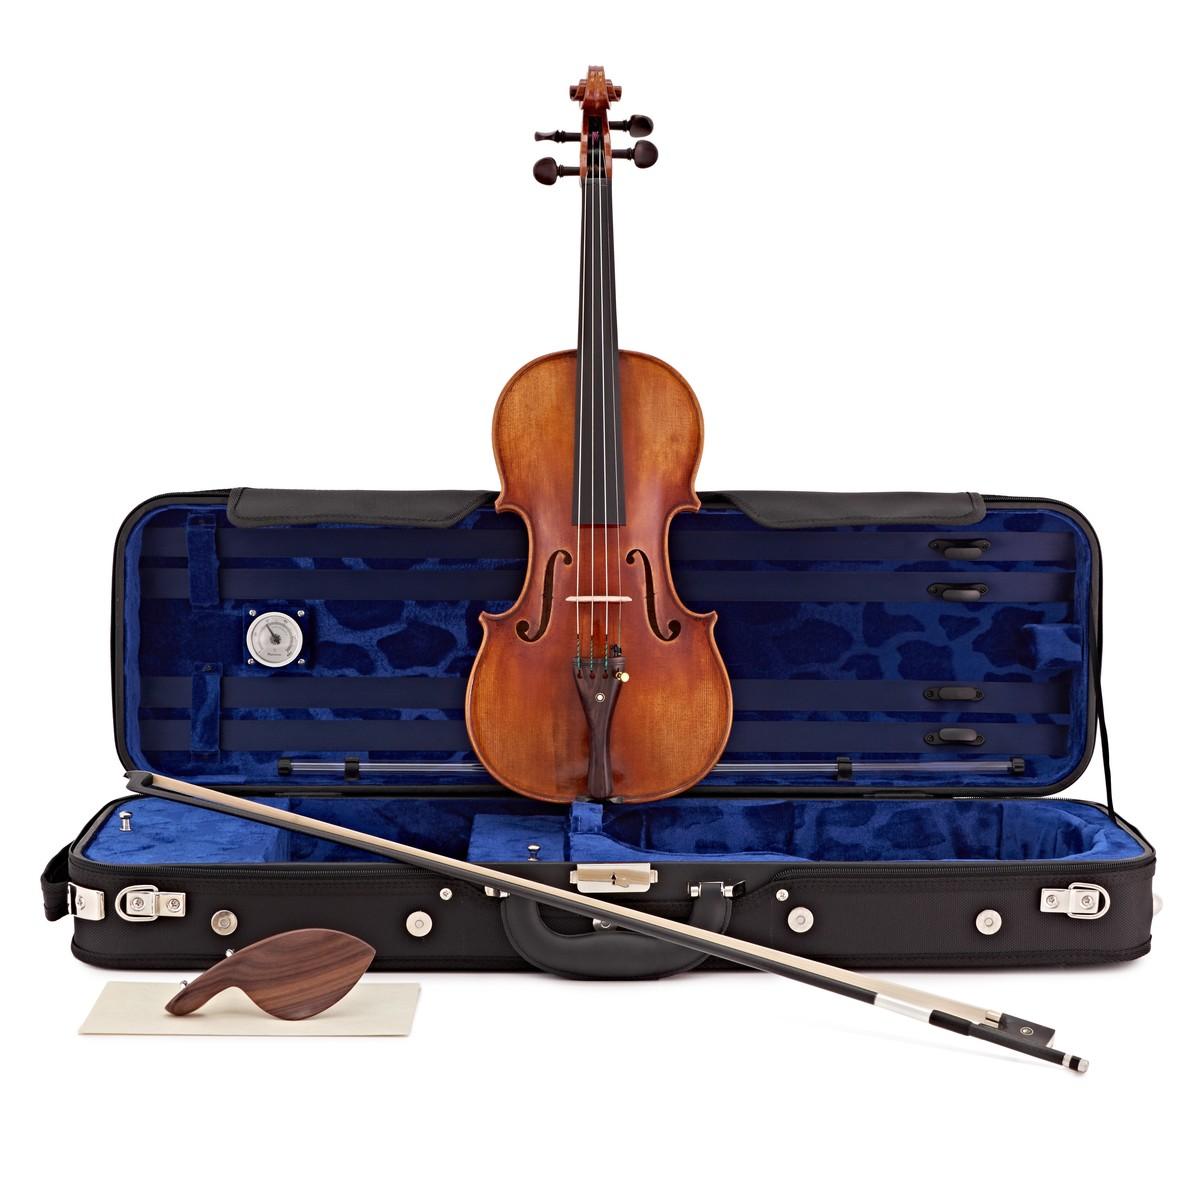 Yamaha Deluxe Violin Av Outfit